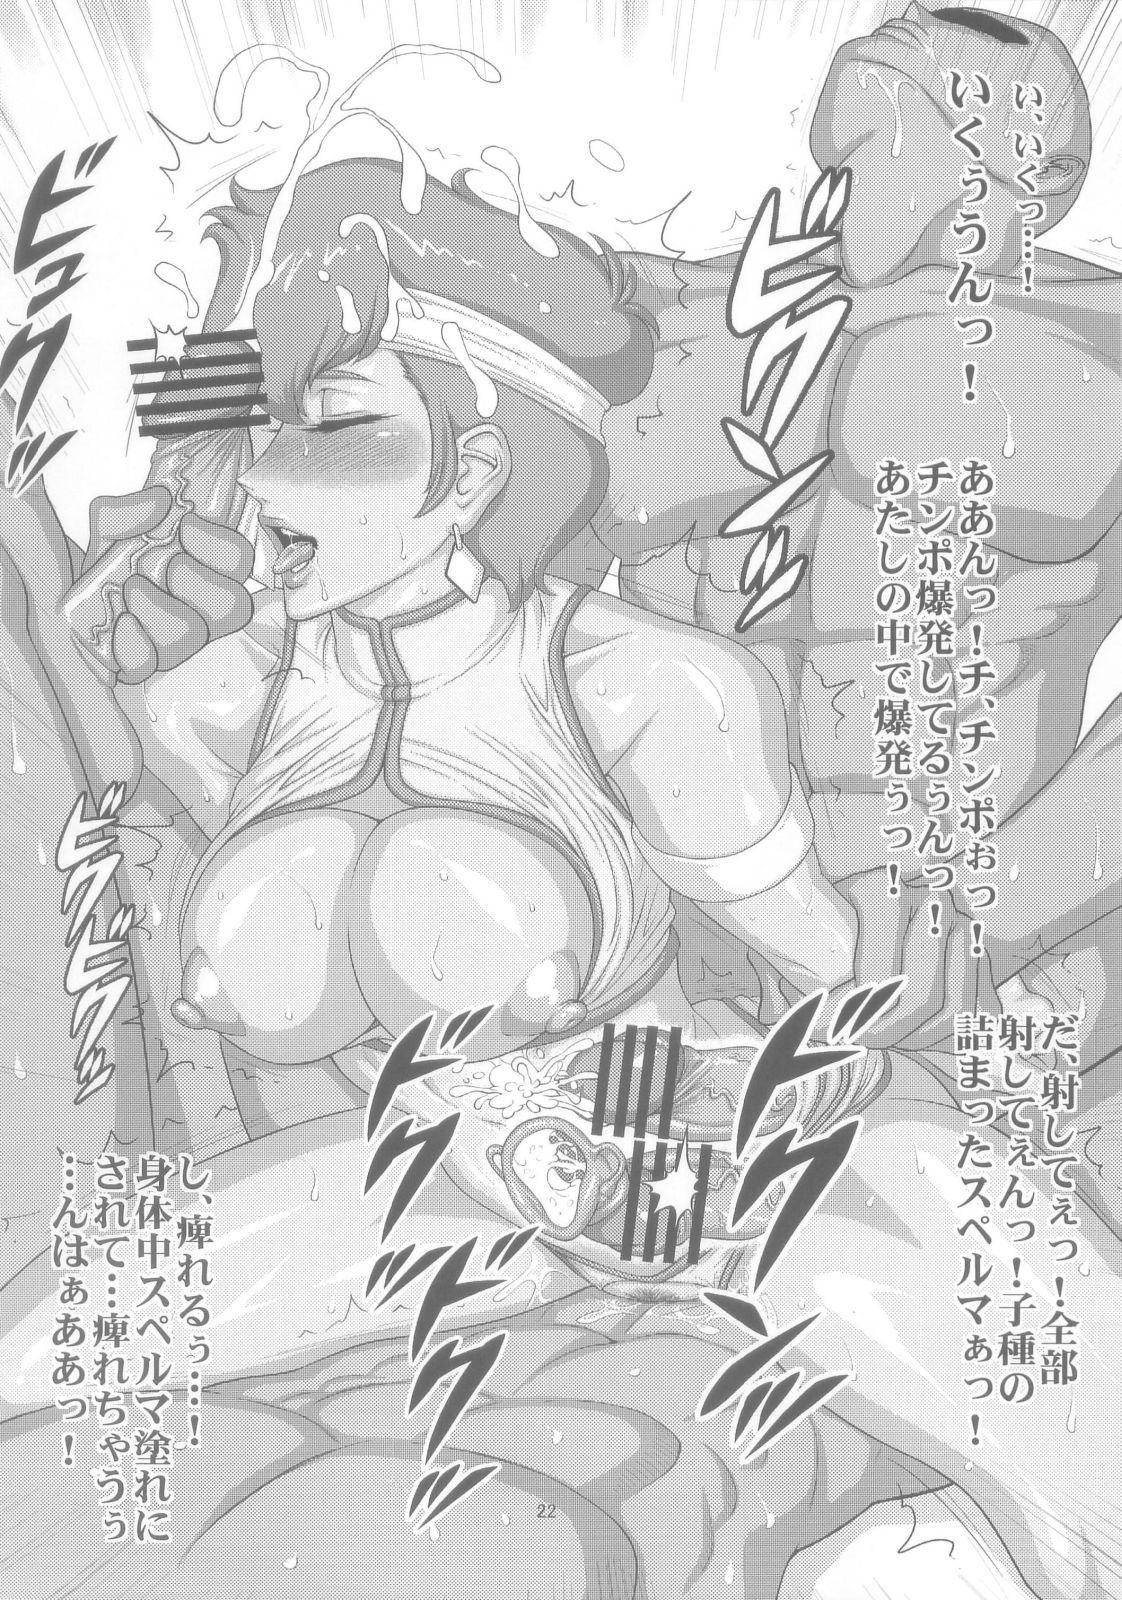 (C83) [Kikumizuan (Kikumizu Shouichi)] Lovely Erotics ~ K*i no Baai ~   Lovely Erotics -The Case of K*i- (Dirty Pair) 23